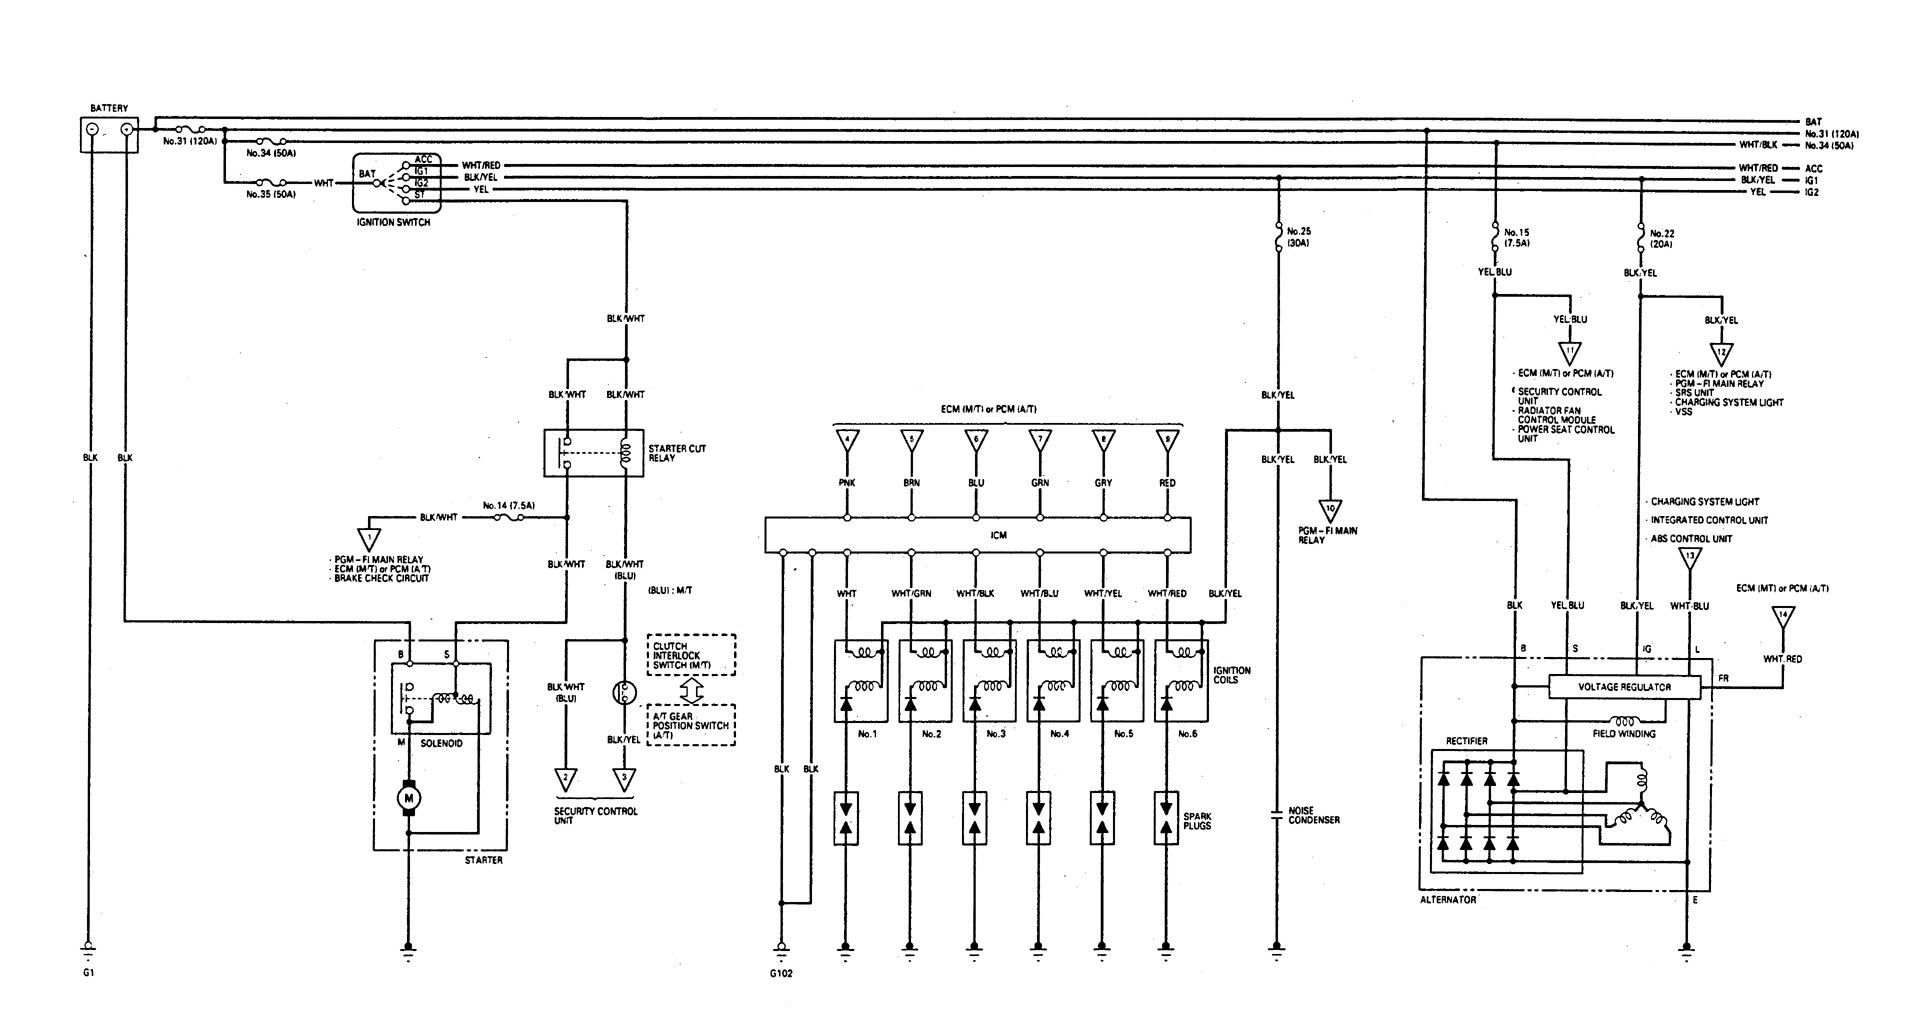 Acura Legend (1993) - wiring diagram - starting - Carknowledge.info | Acura Legend Fuel Pump Wiring Diagram |  | Carknowledge.info